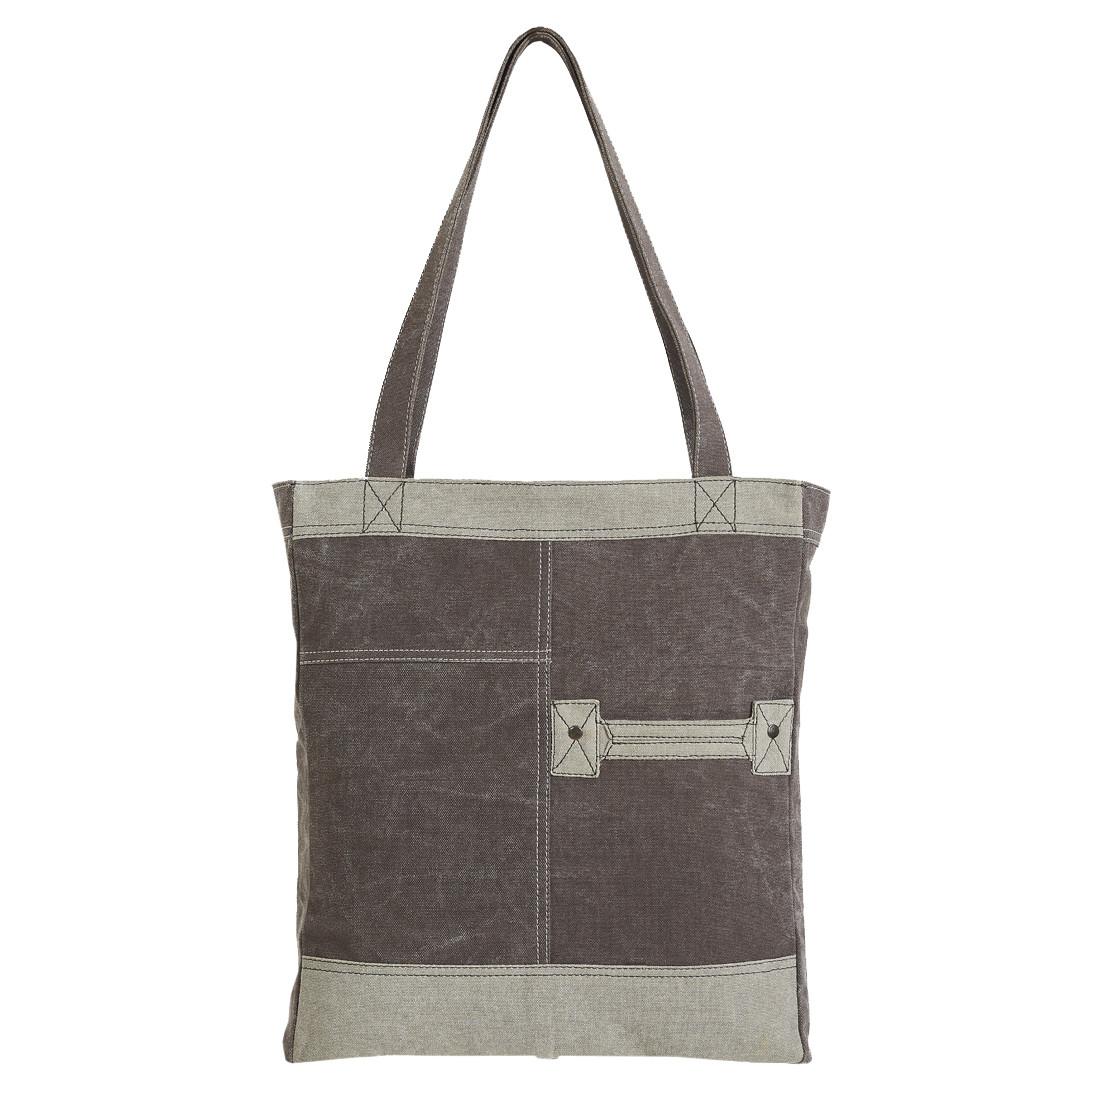 Mona B Rory Tote Bag Purse